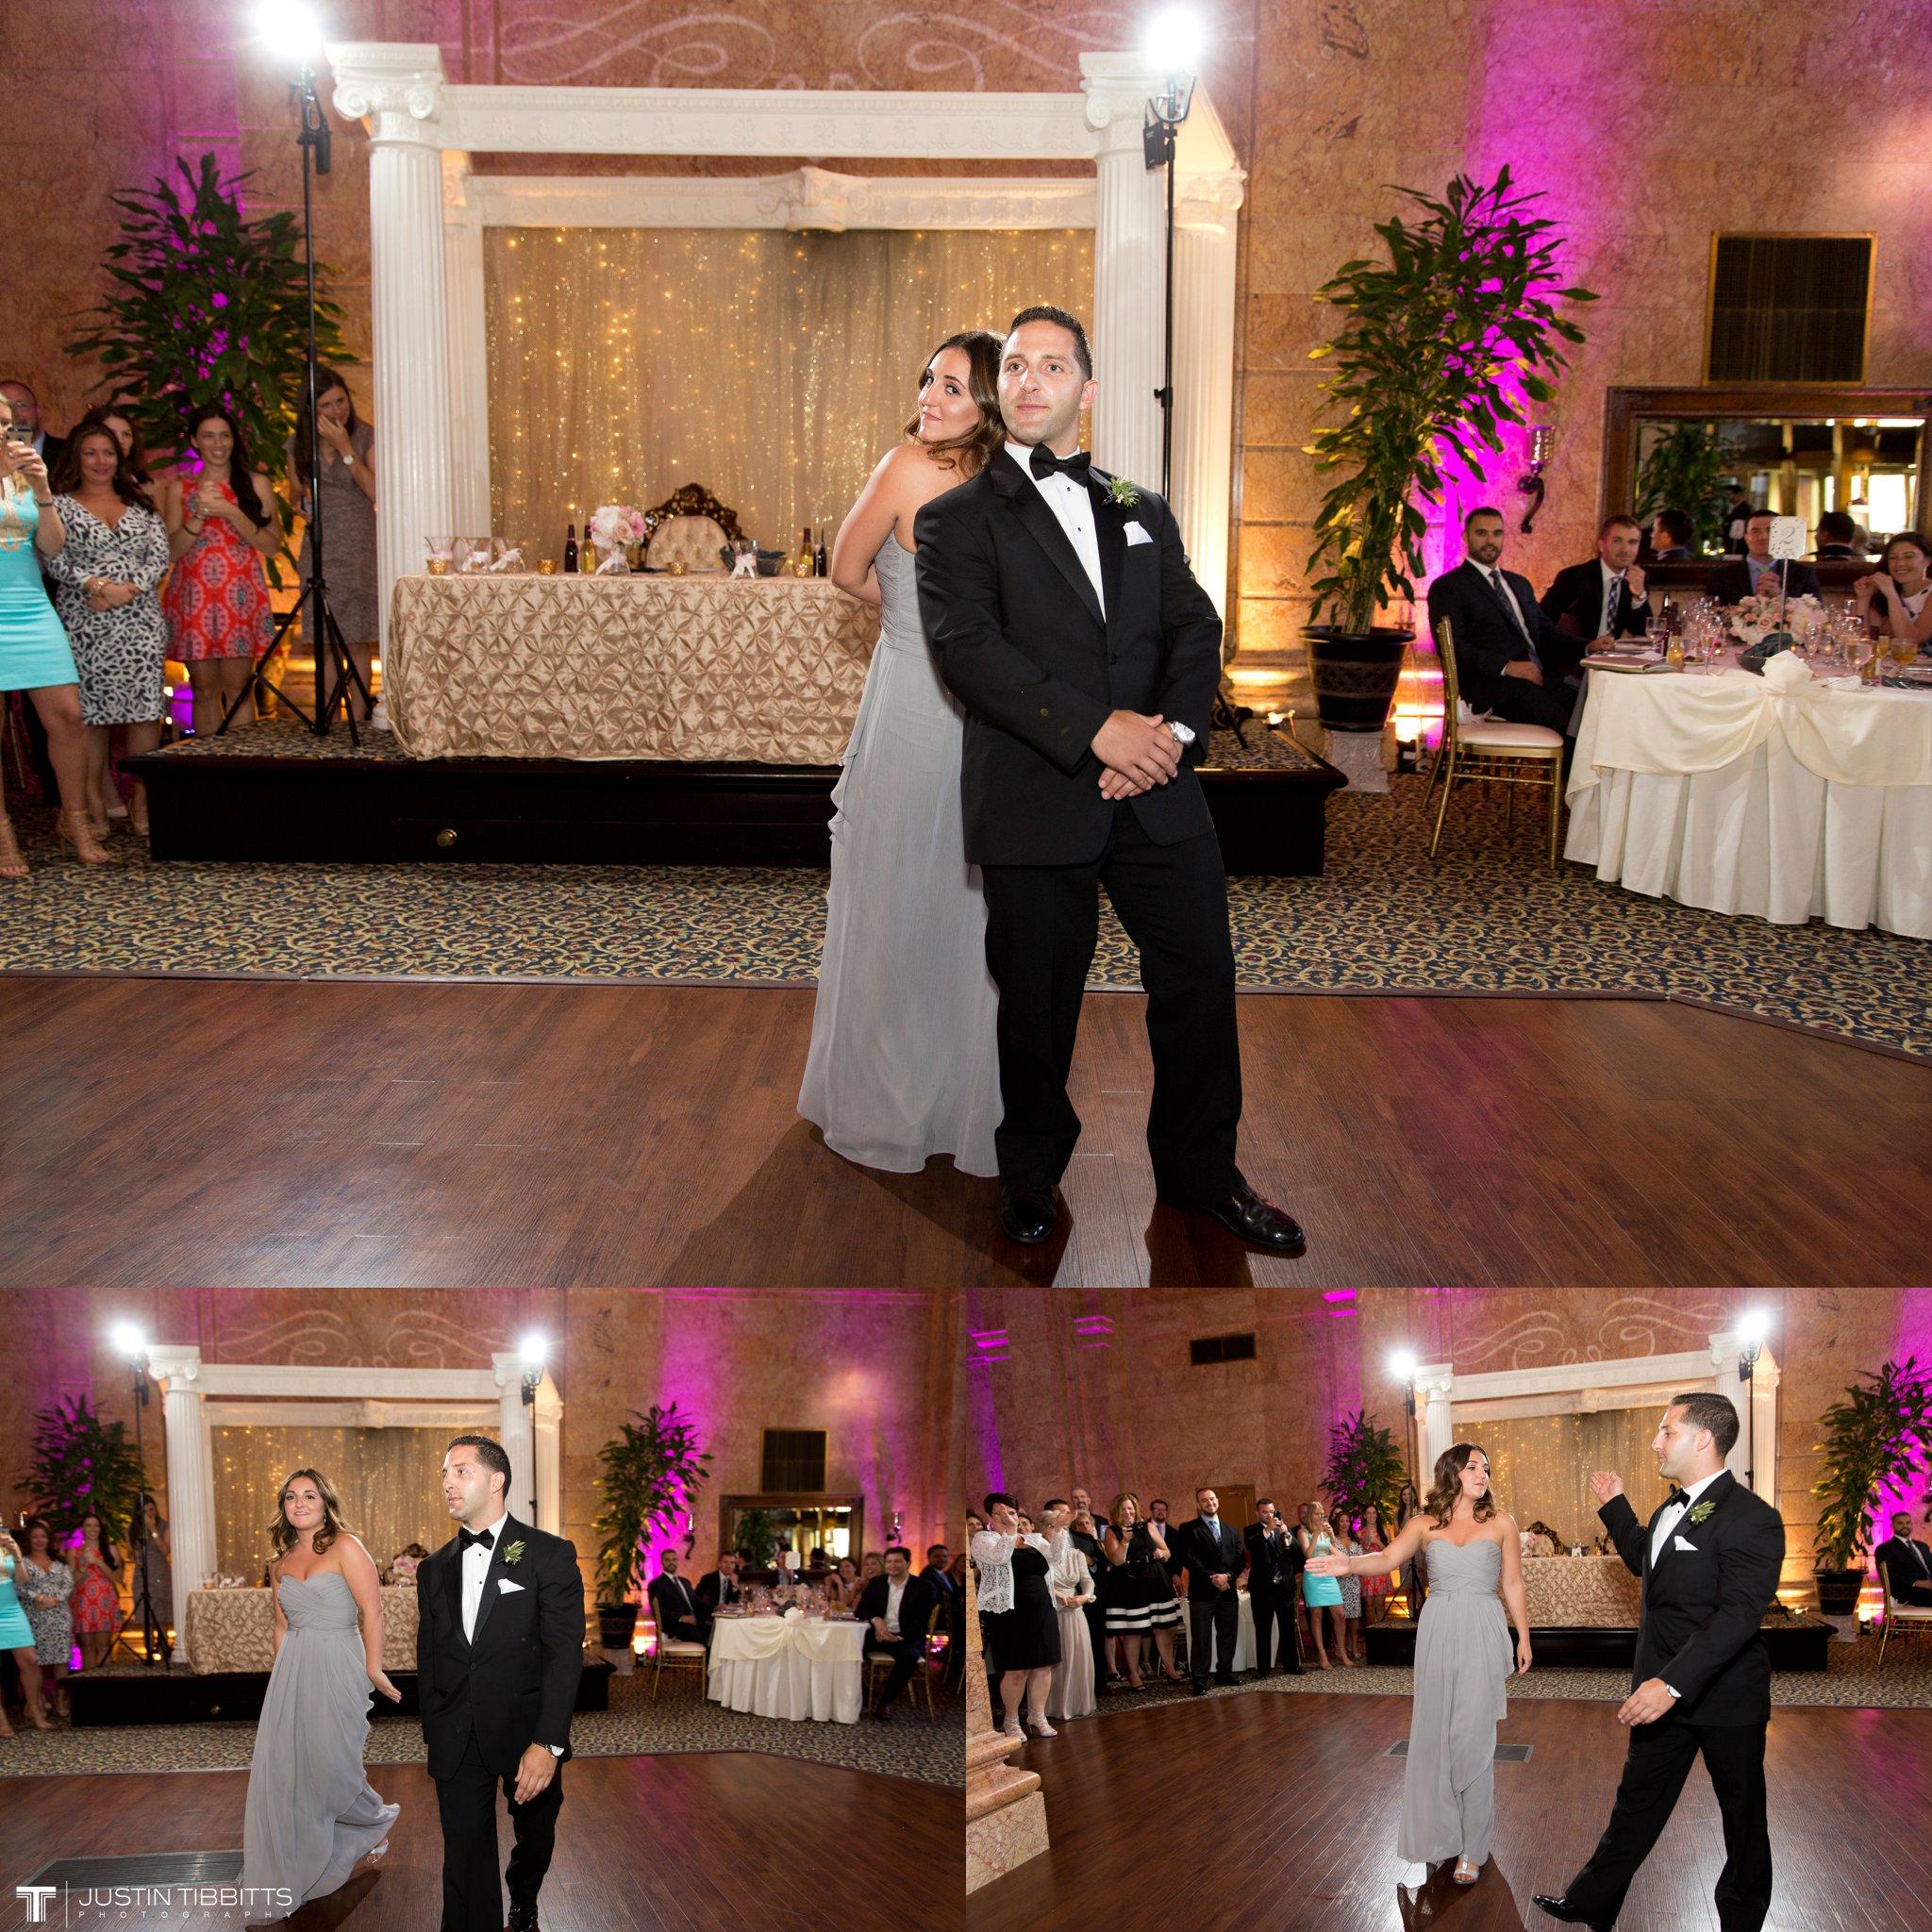 state-room-wedding-photos-with-amanda-and-nick_0147